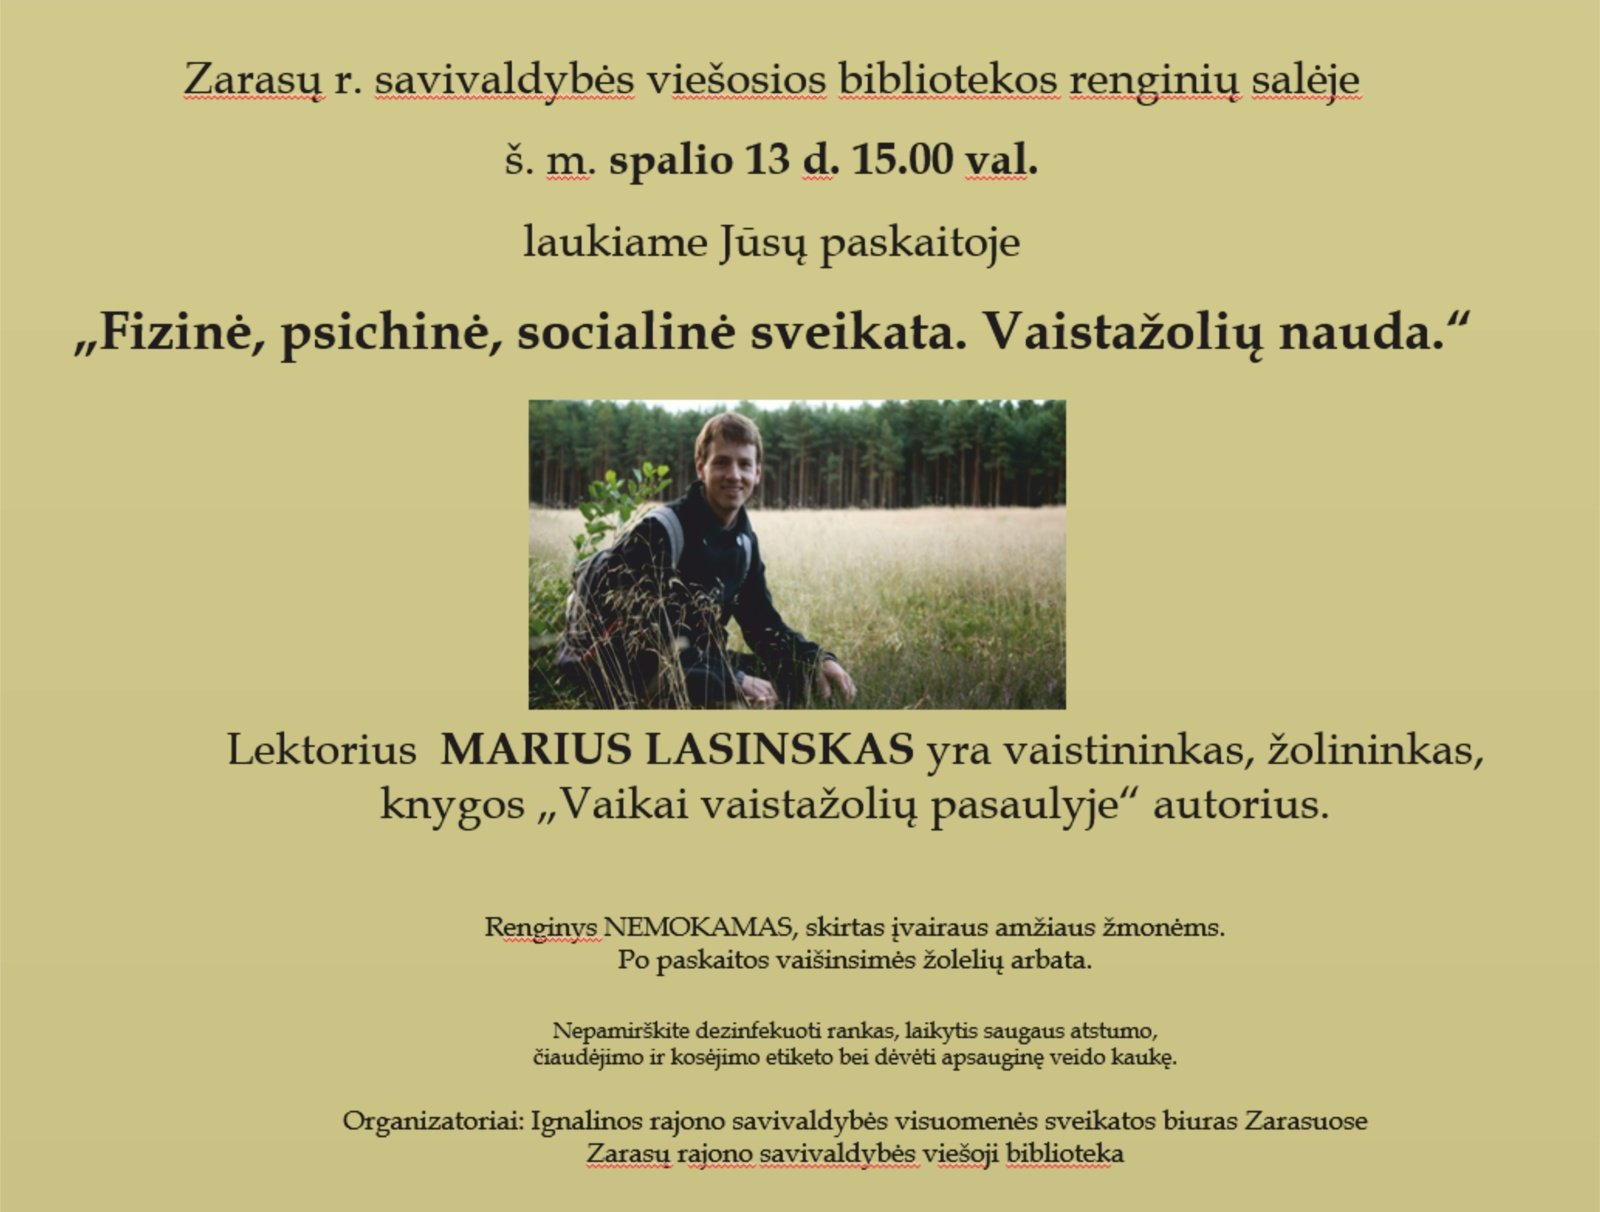 Paskaita su žolininku Mariumi Lasinsku